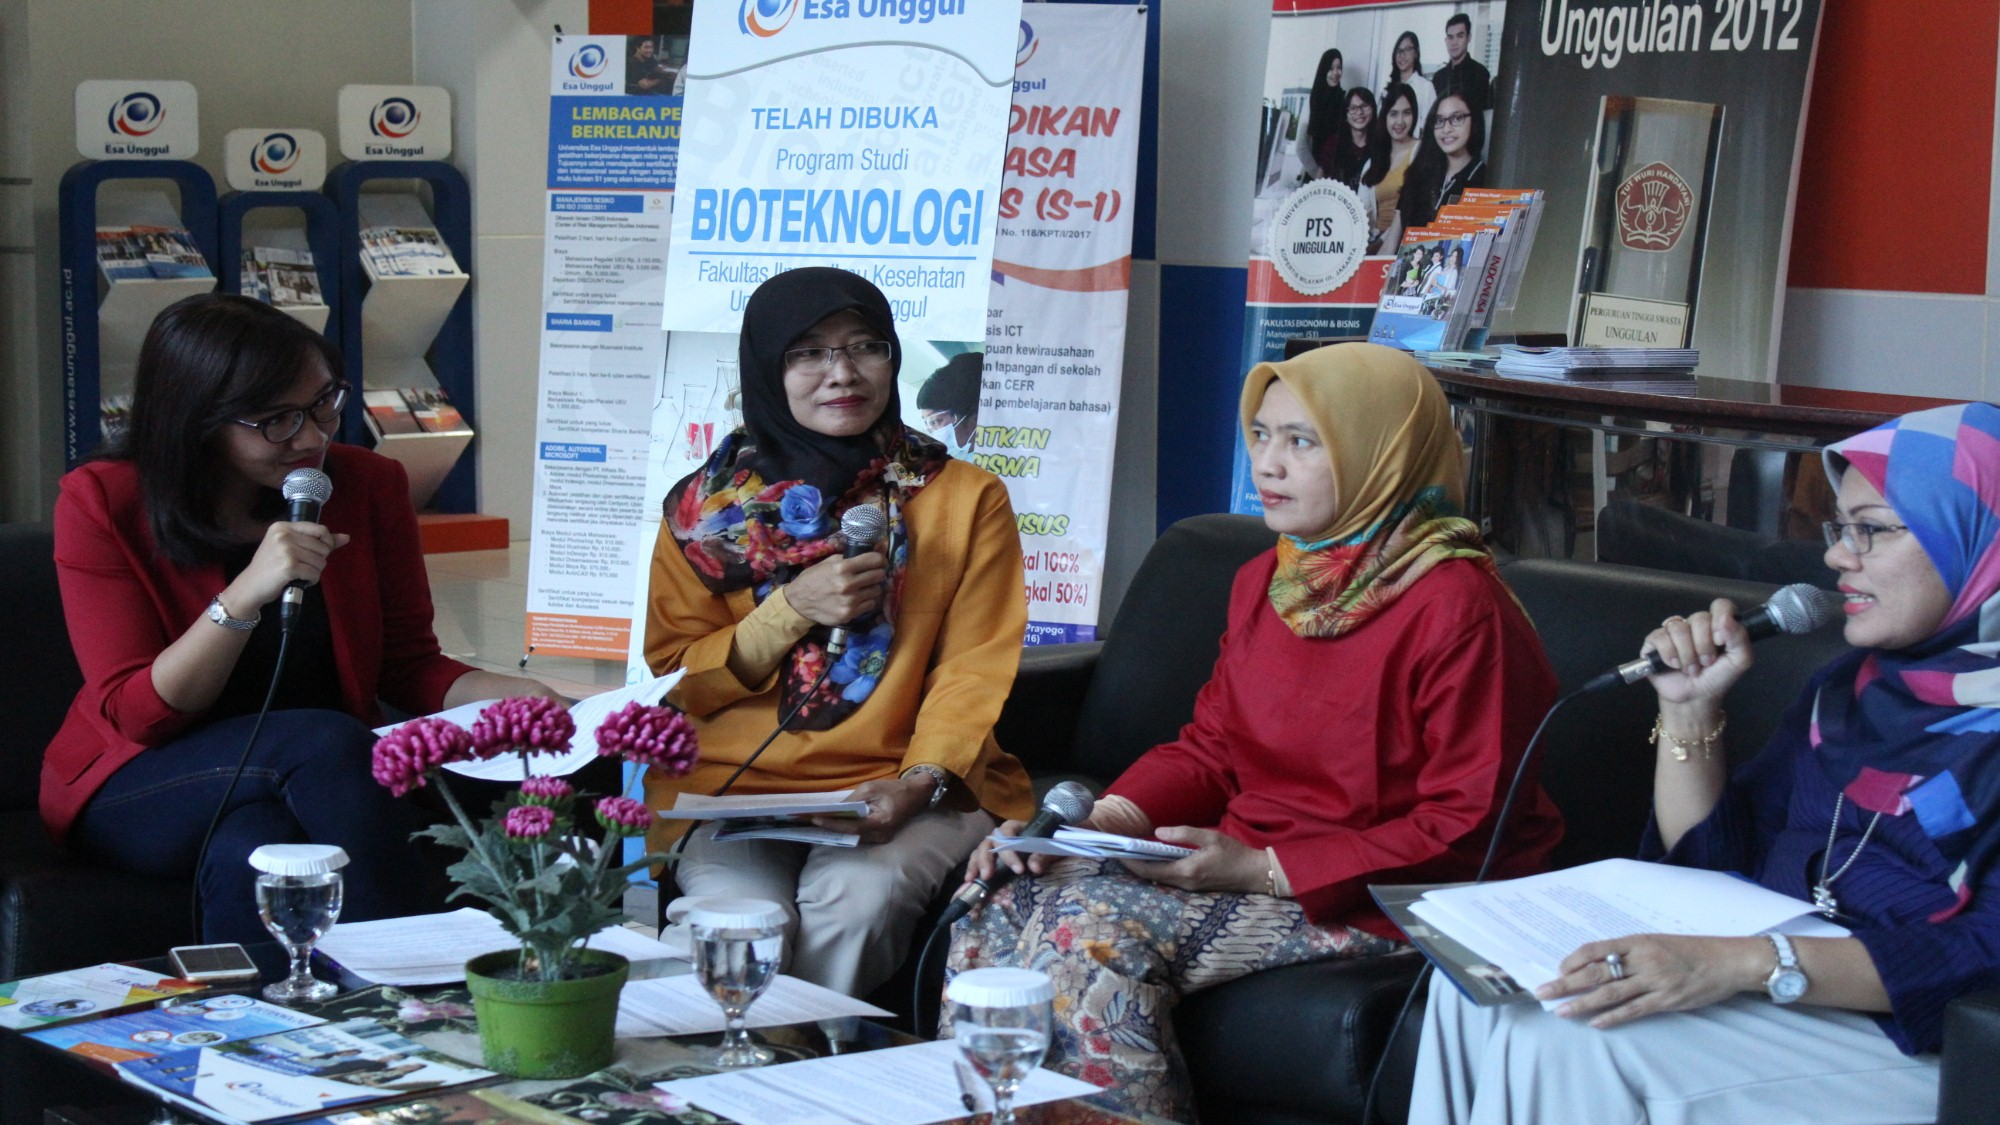 Esa Unggul Mengudara di 100 Radio Seluruh Indonesia